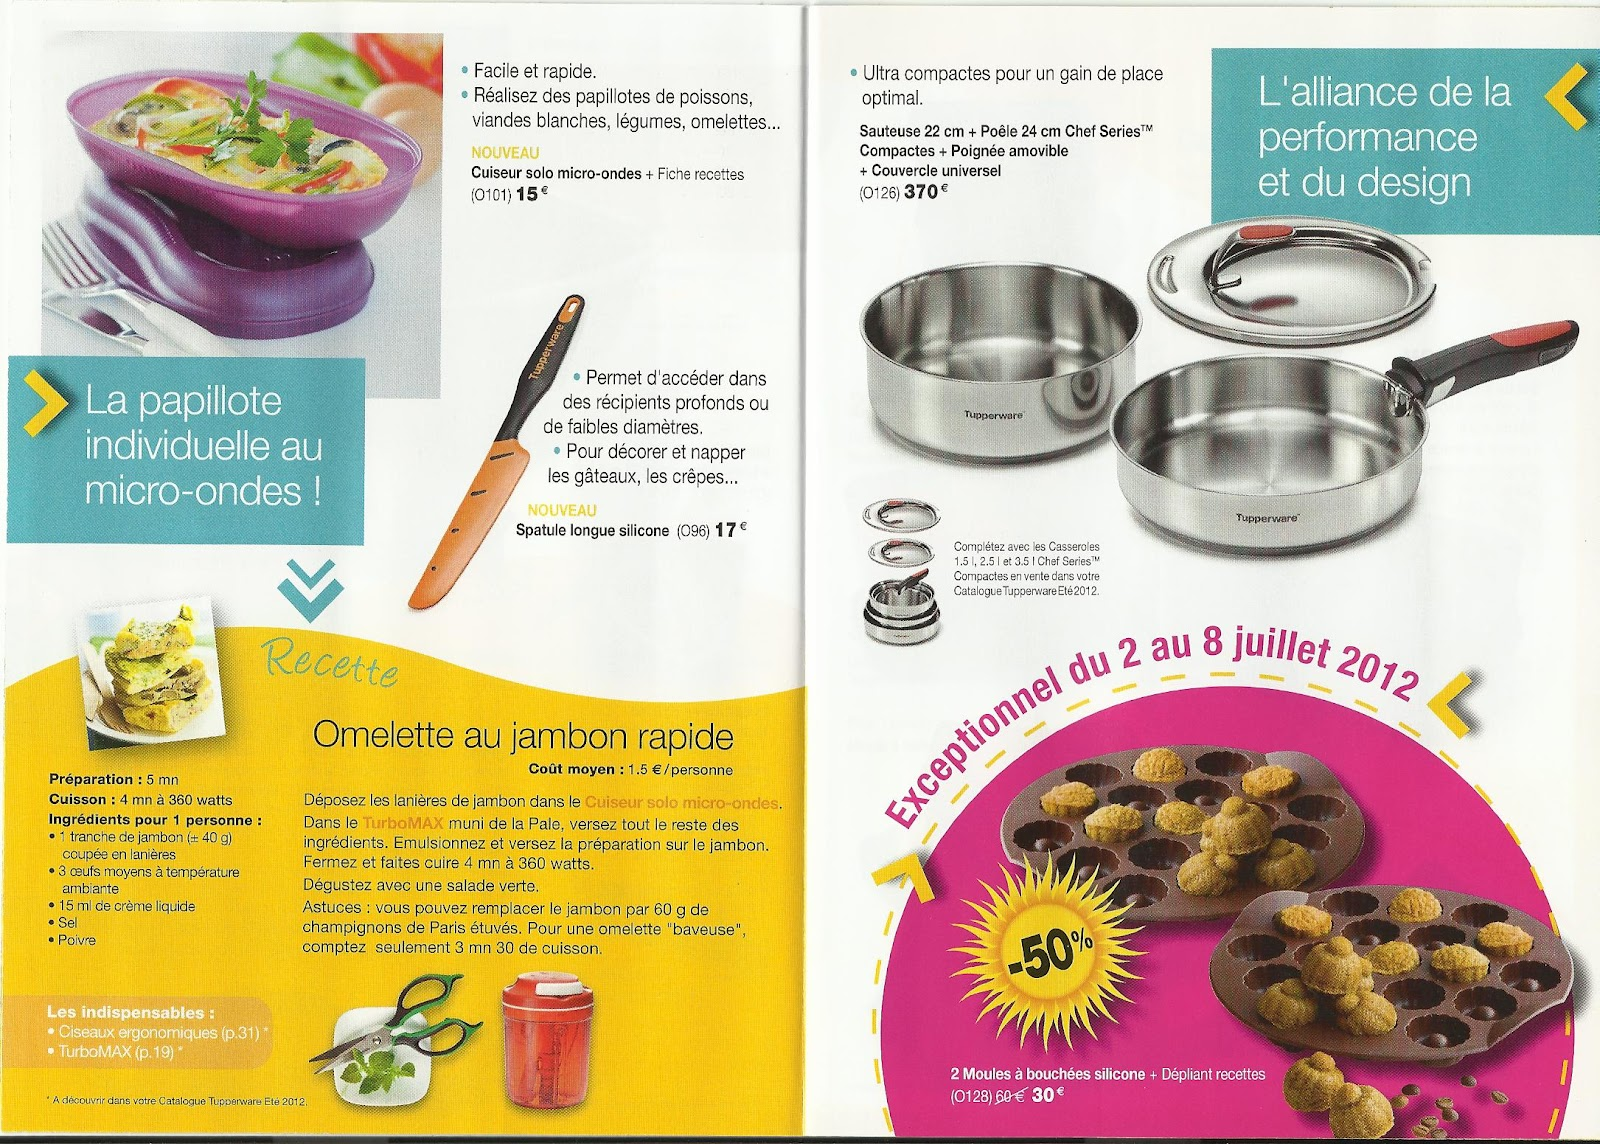 Berühmt Amélie, Gourmandises & Tupperware: juin 2012 YL76